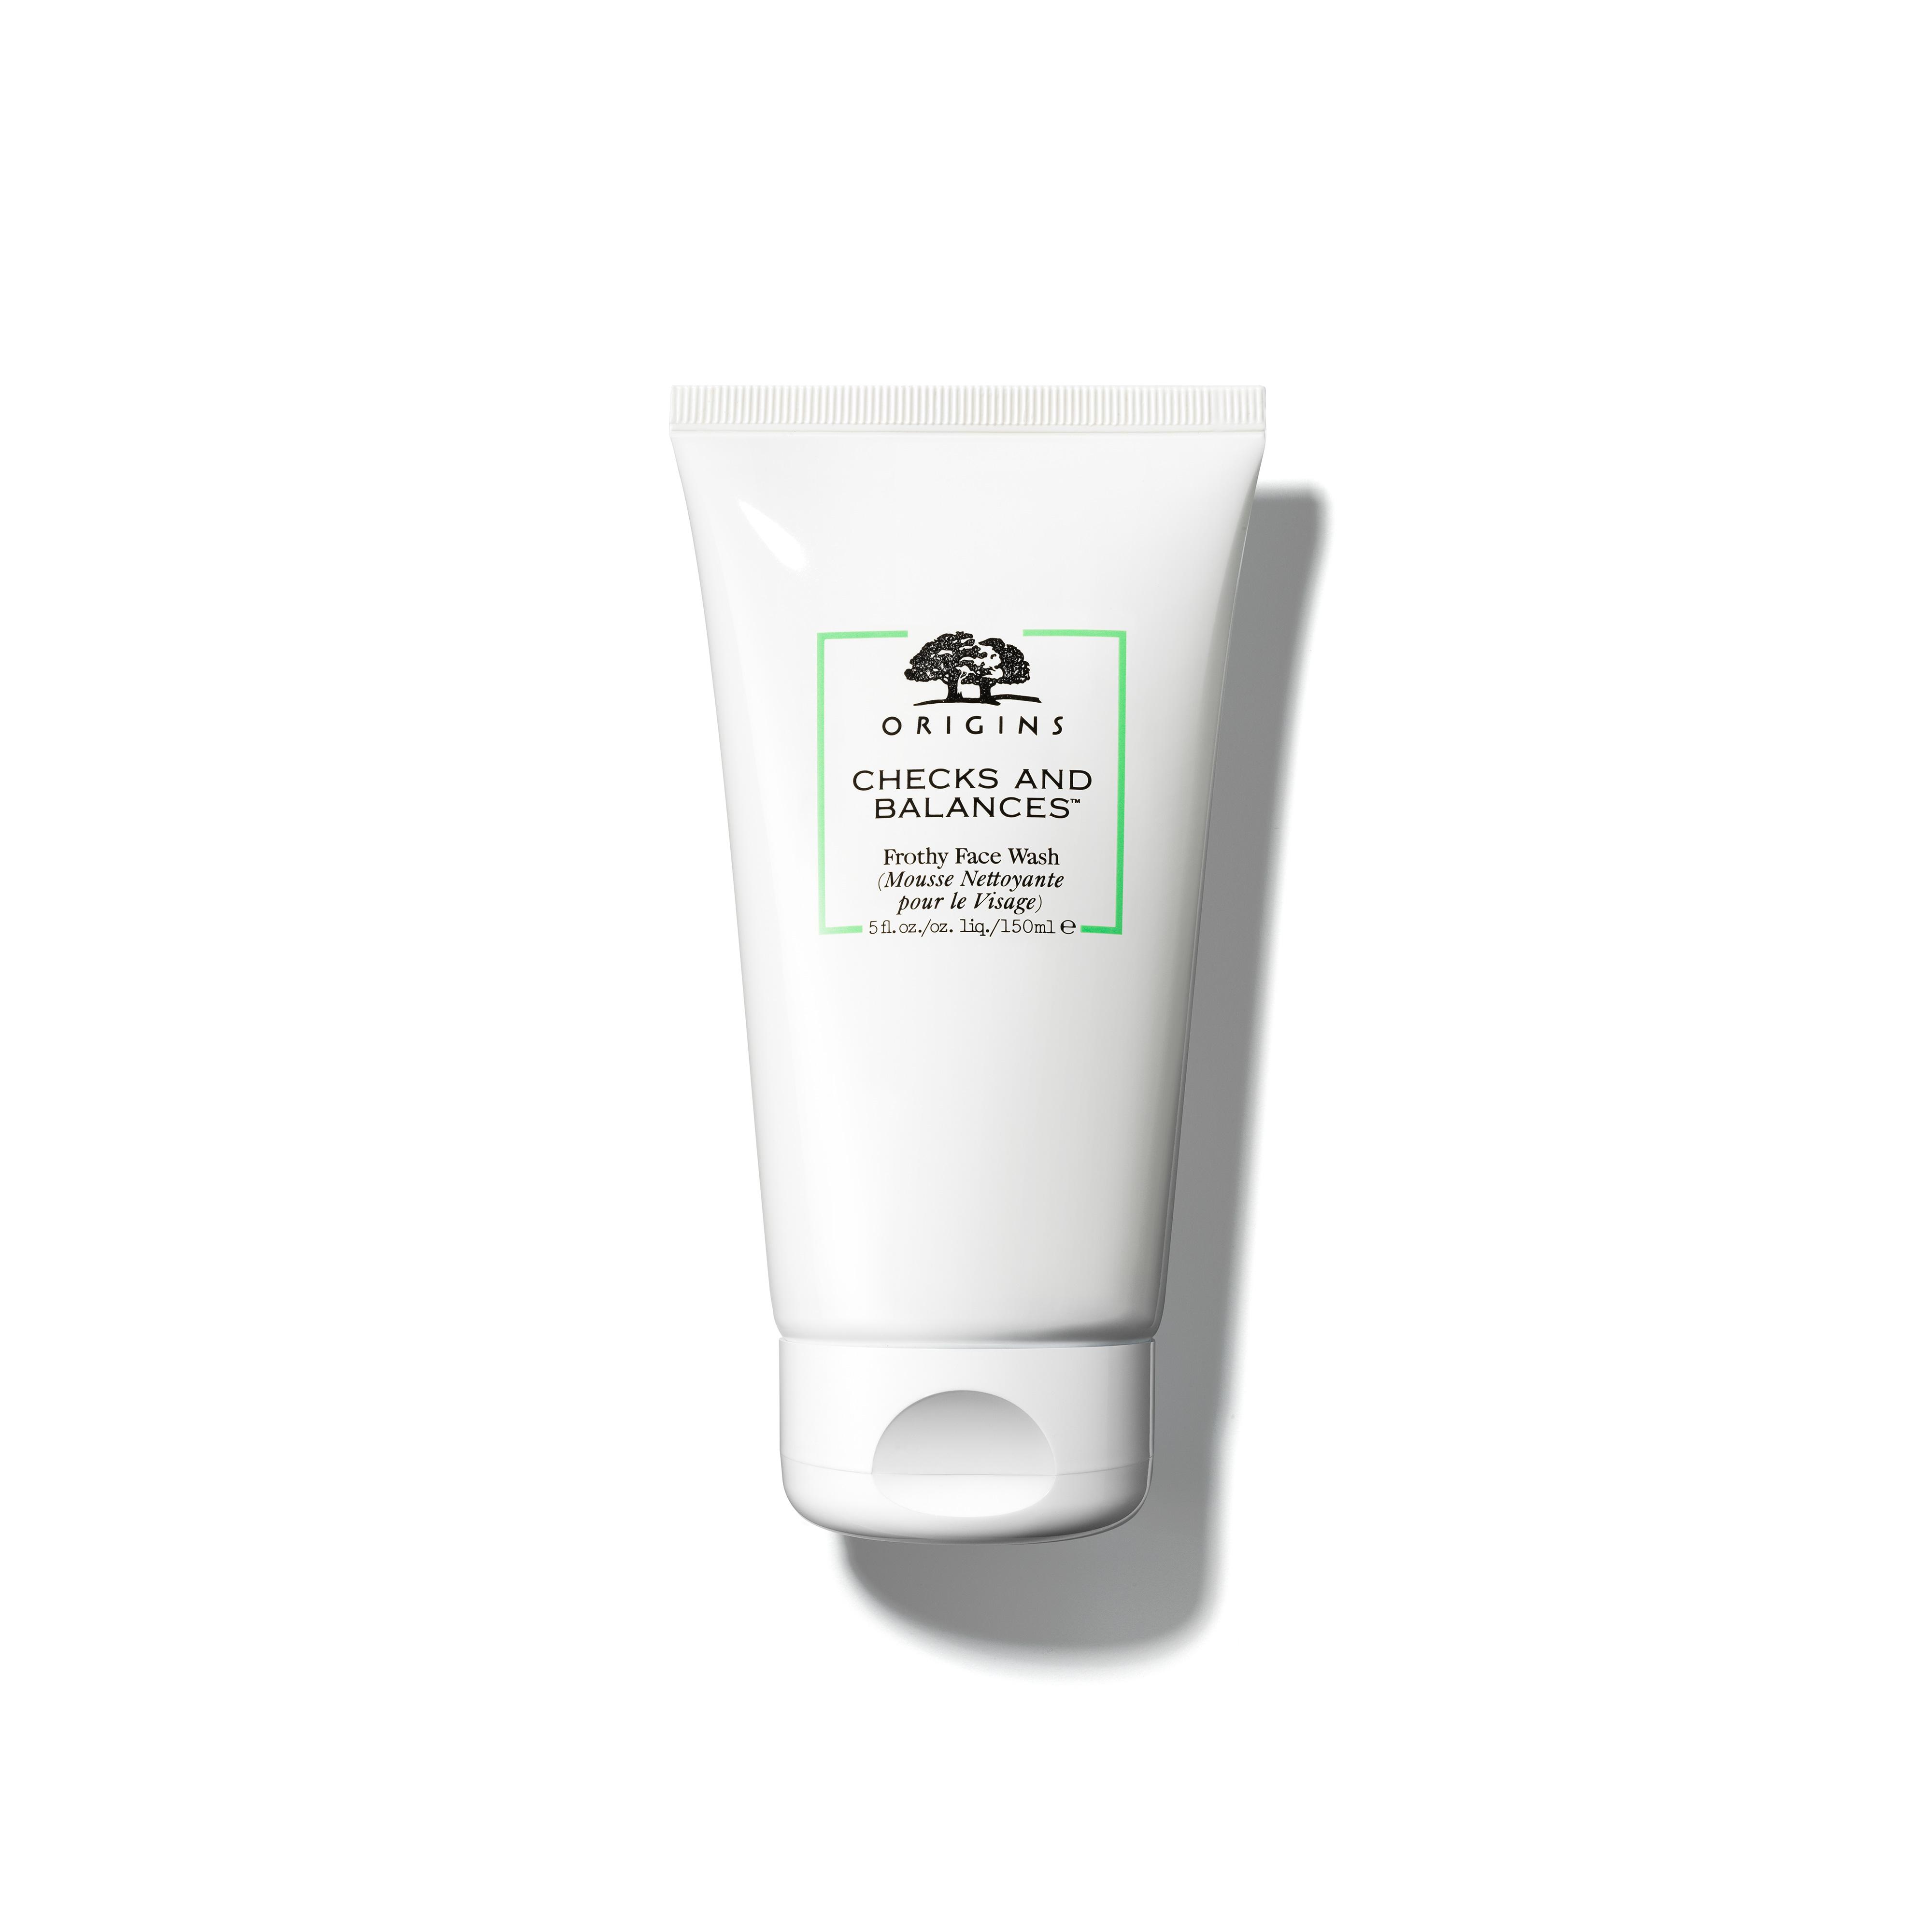 Origins - Checks And Balances Frothy Face Wash 150ml